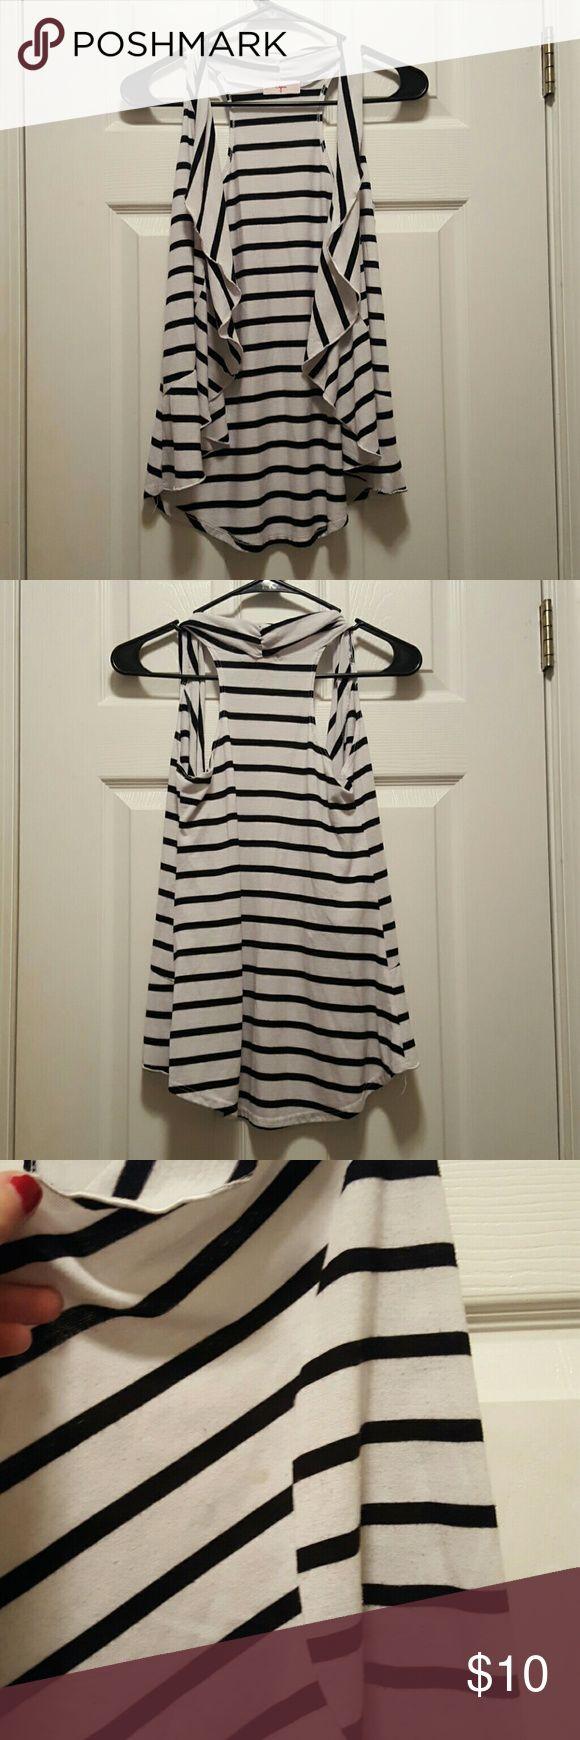 Vest Black and white, small stain under front fringe Aqua Jackets & Coats Vests